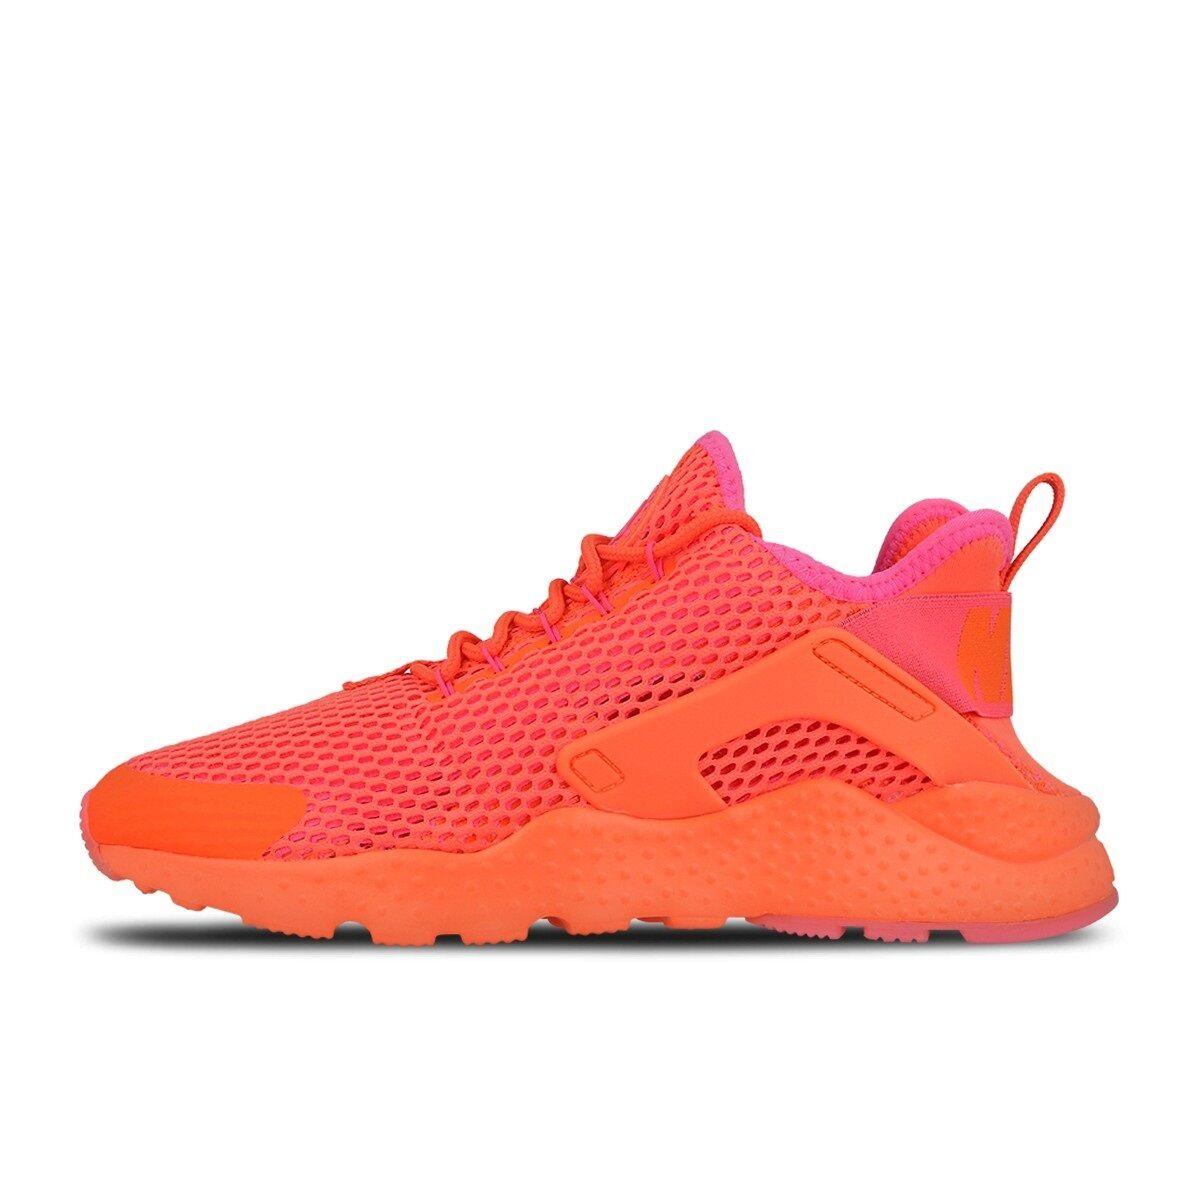 Nike Air Huarache Run Ultra Breathe 833292-800 Total Crimson Pink Blast Red Rare Special limited time